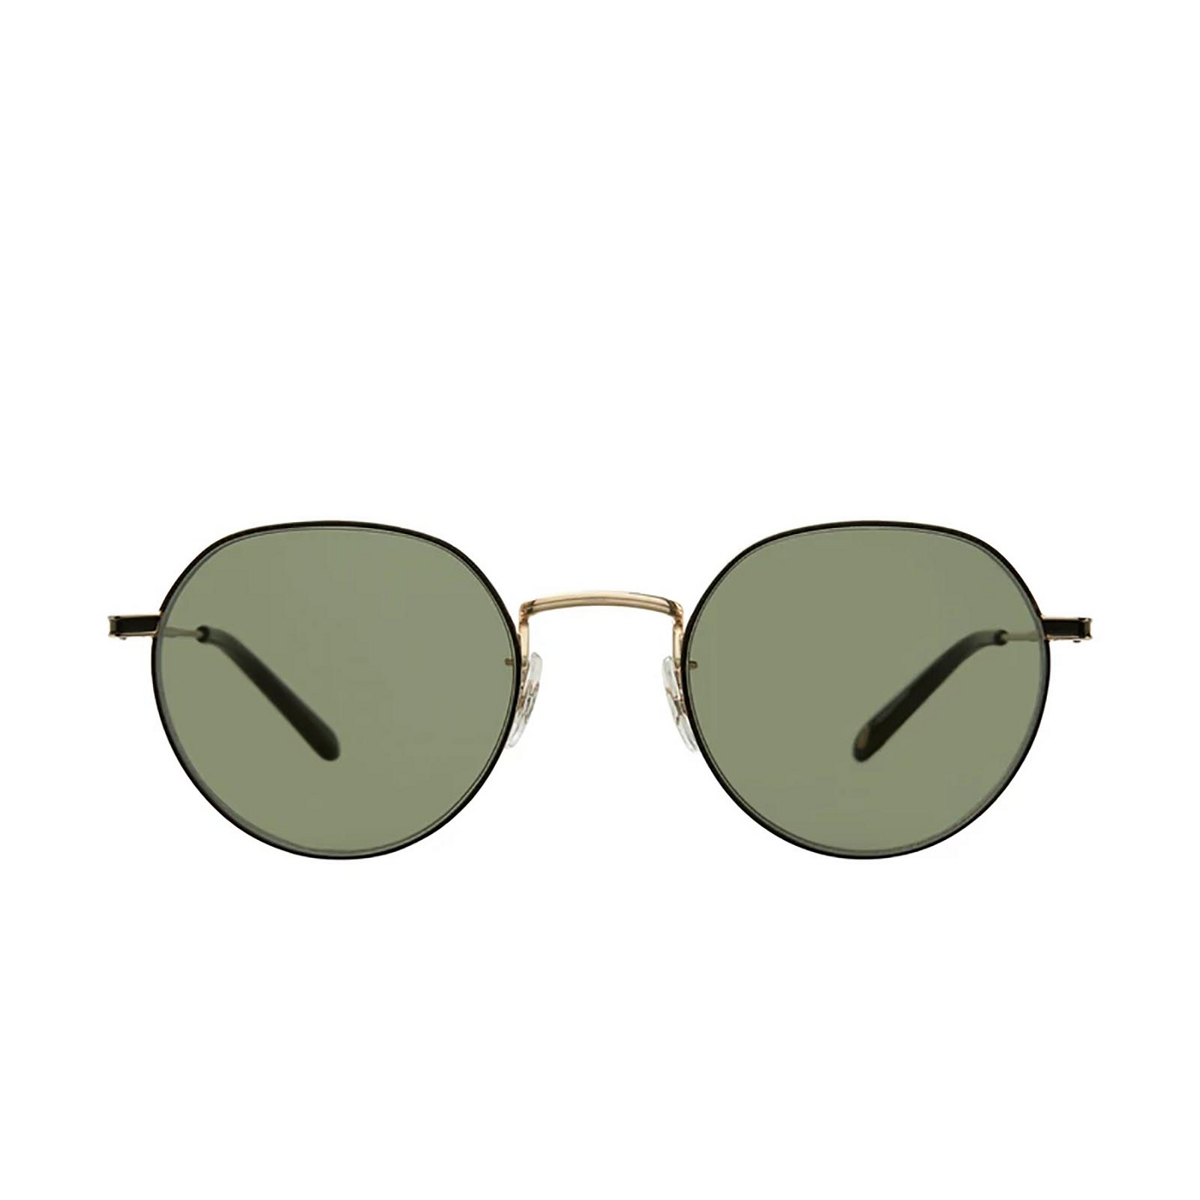 Garrett Leight® Irregular Sunglasses: Robson Sun color Gold-black G-bk/sfgrn.